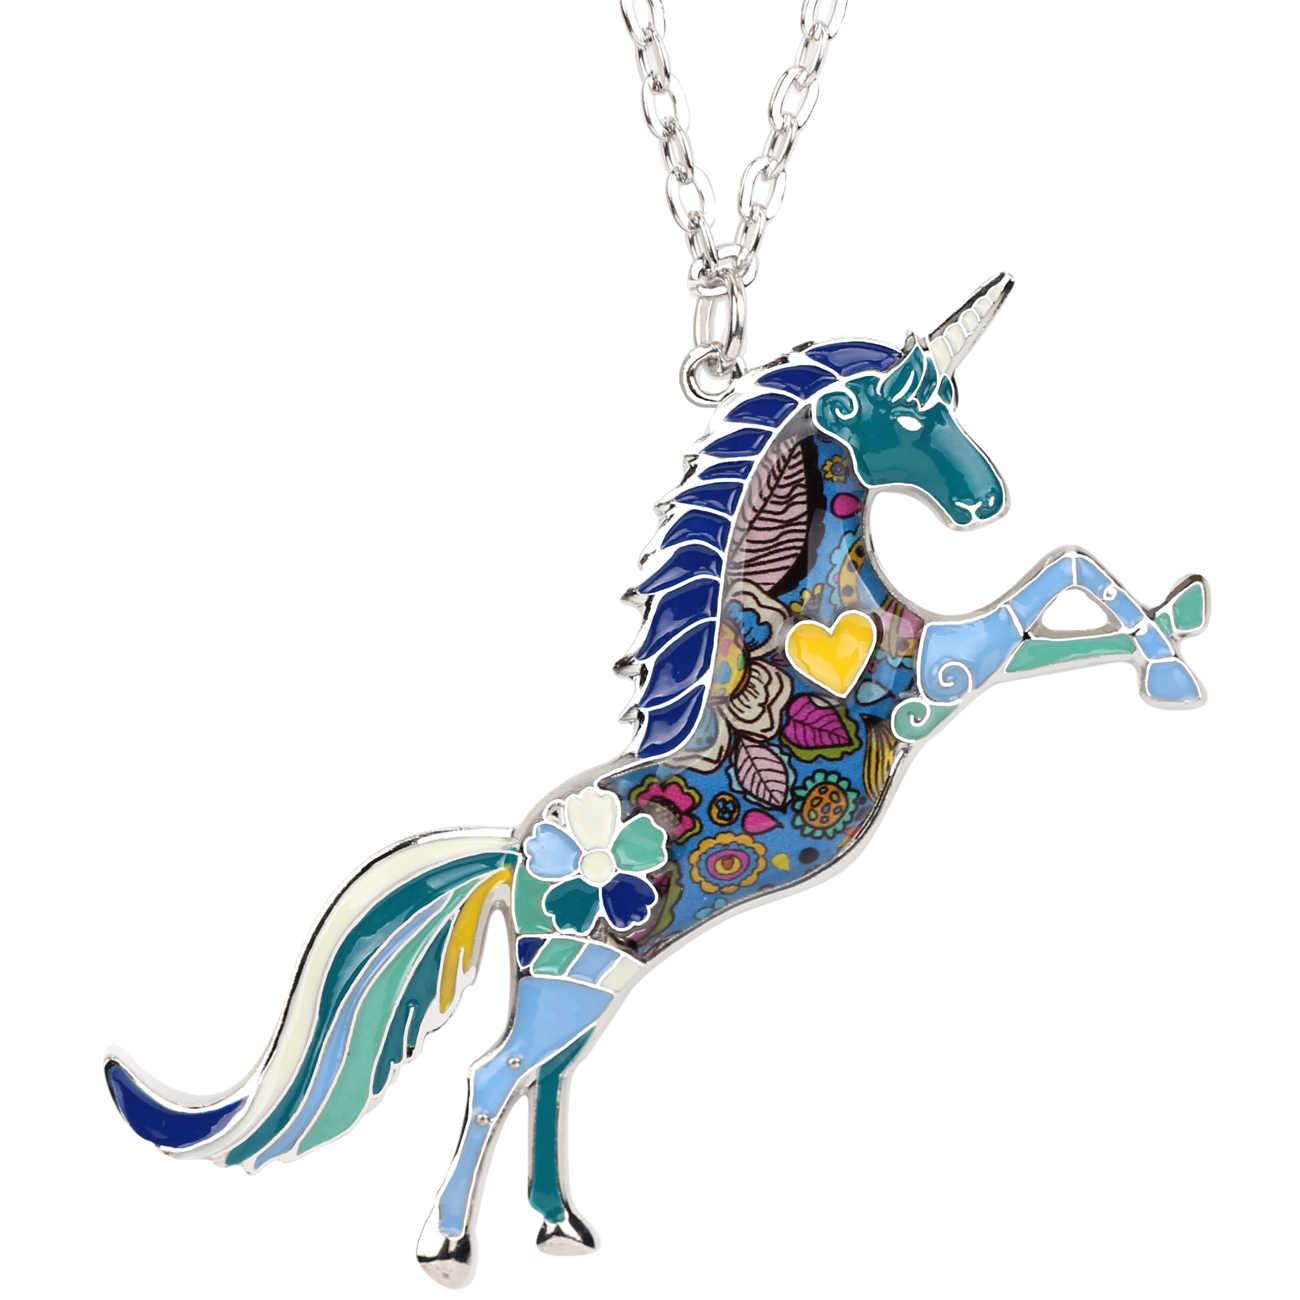 WEVENI المينا سبائك يونيكورن الحصان قلادة سلسلة بدلاية طوق Fiary مجوهرات بأشكال حيوانات للنساء الفتيات Birthdaty هدية هبوط السفينة